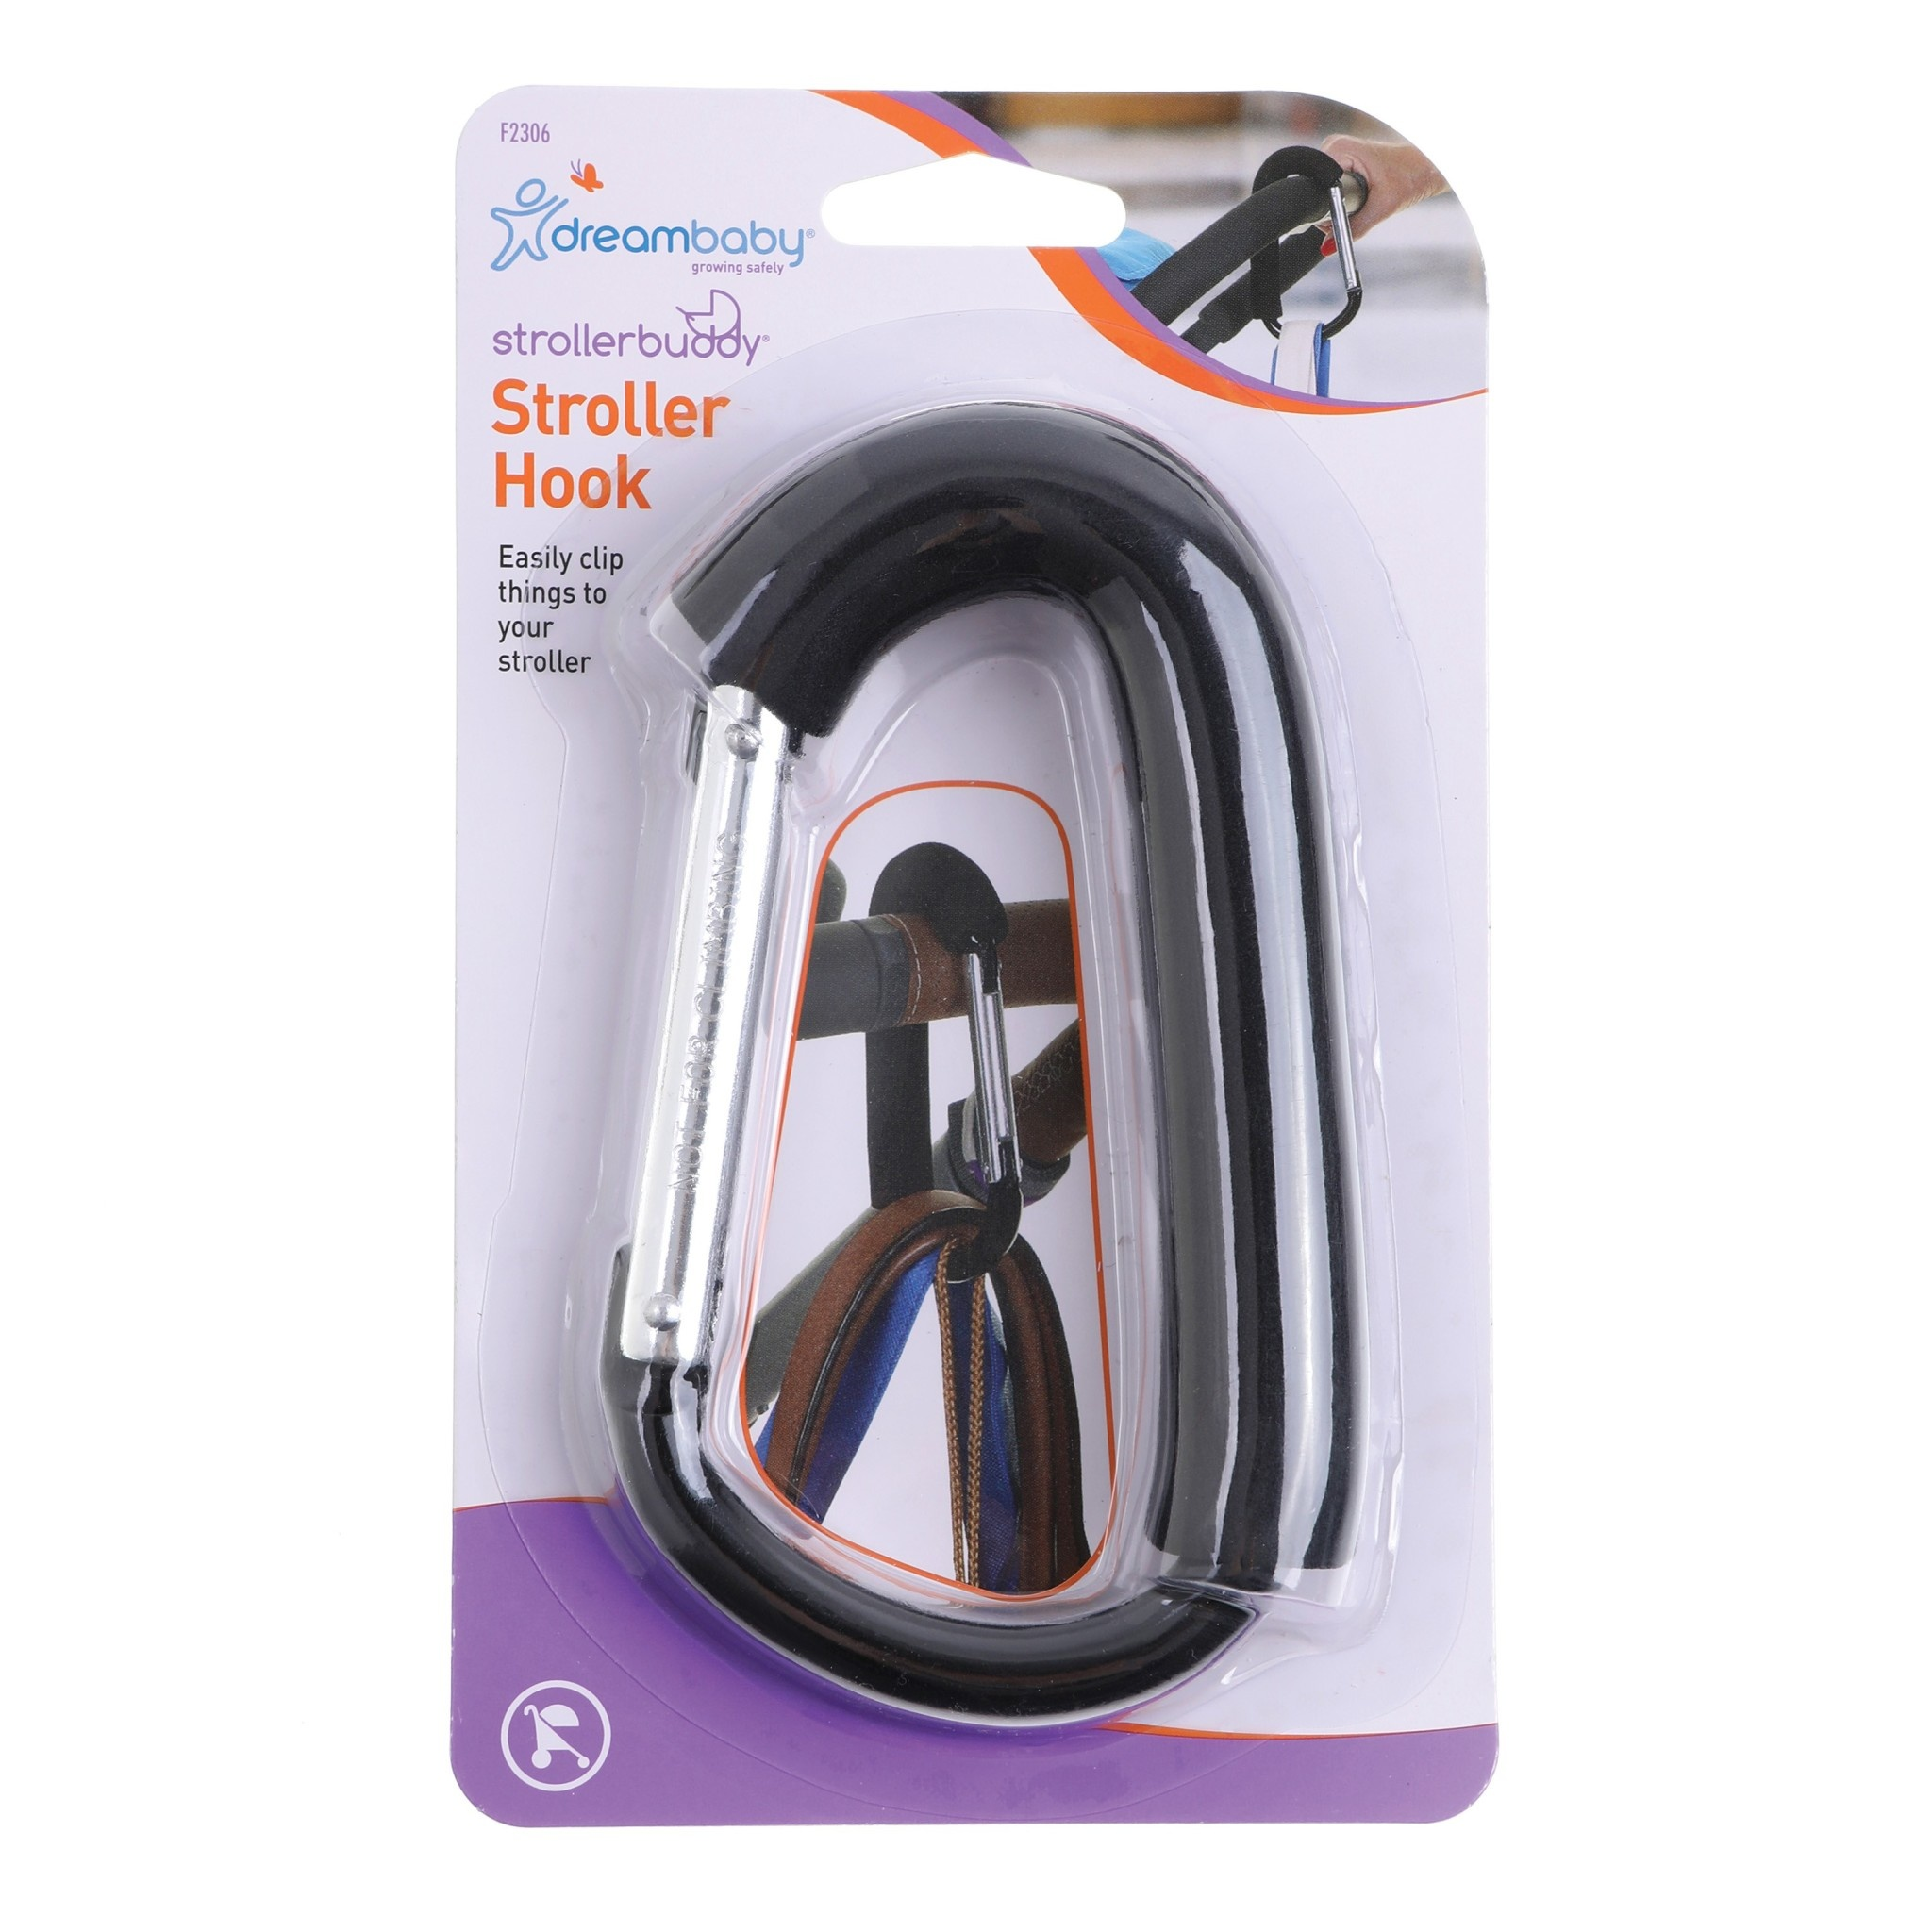 Dreambaby DreamBaby Stroller Hook